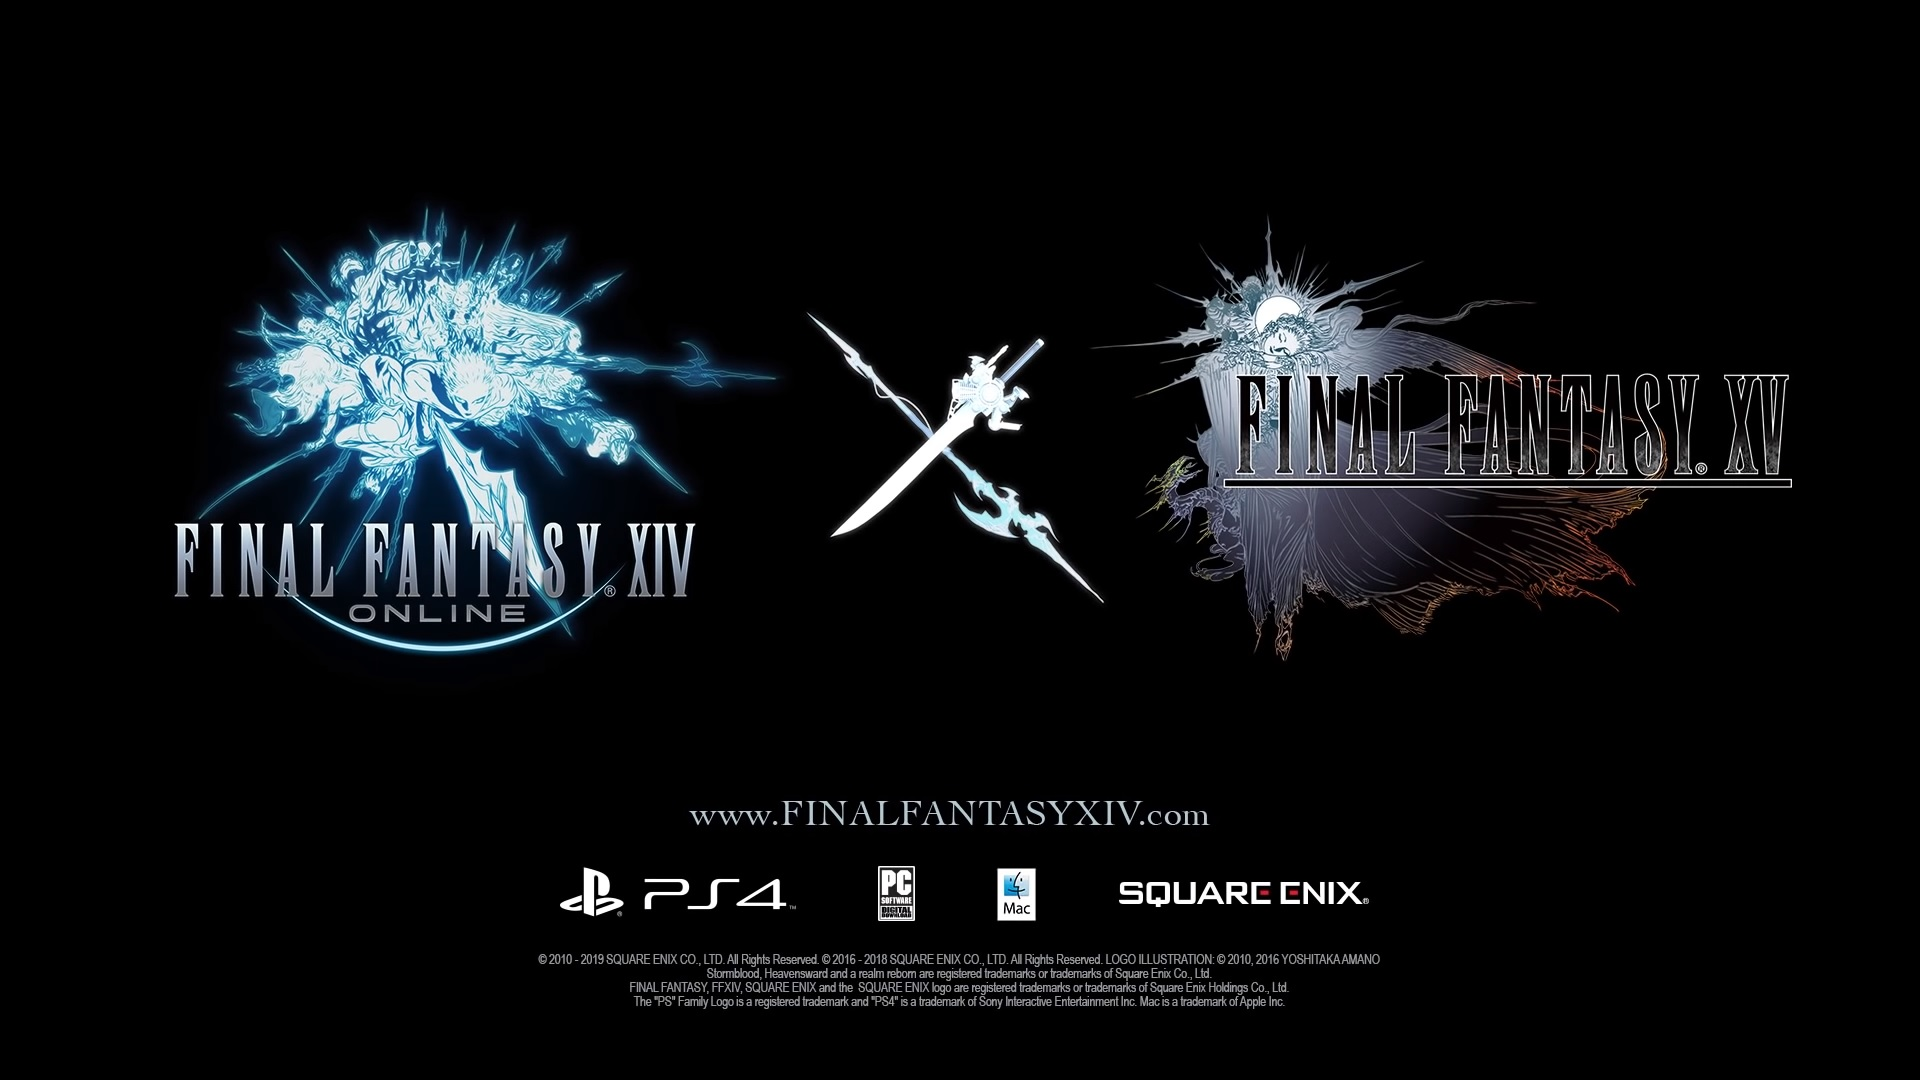 Final-Fantasy-XIV-x-Final-Fantasy-XV